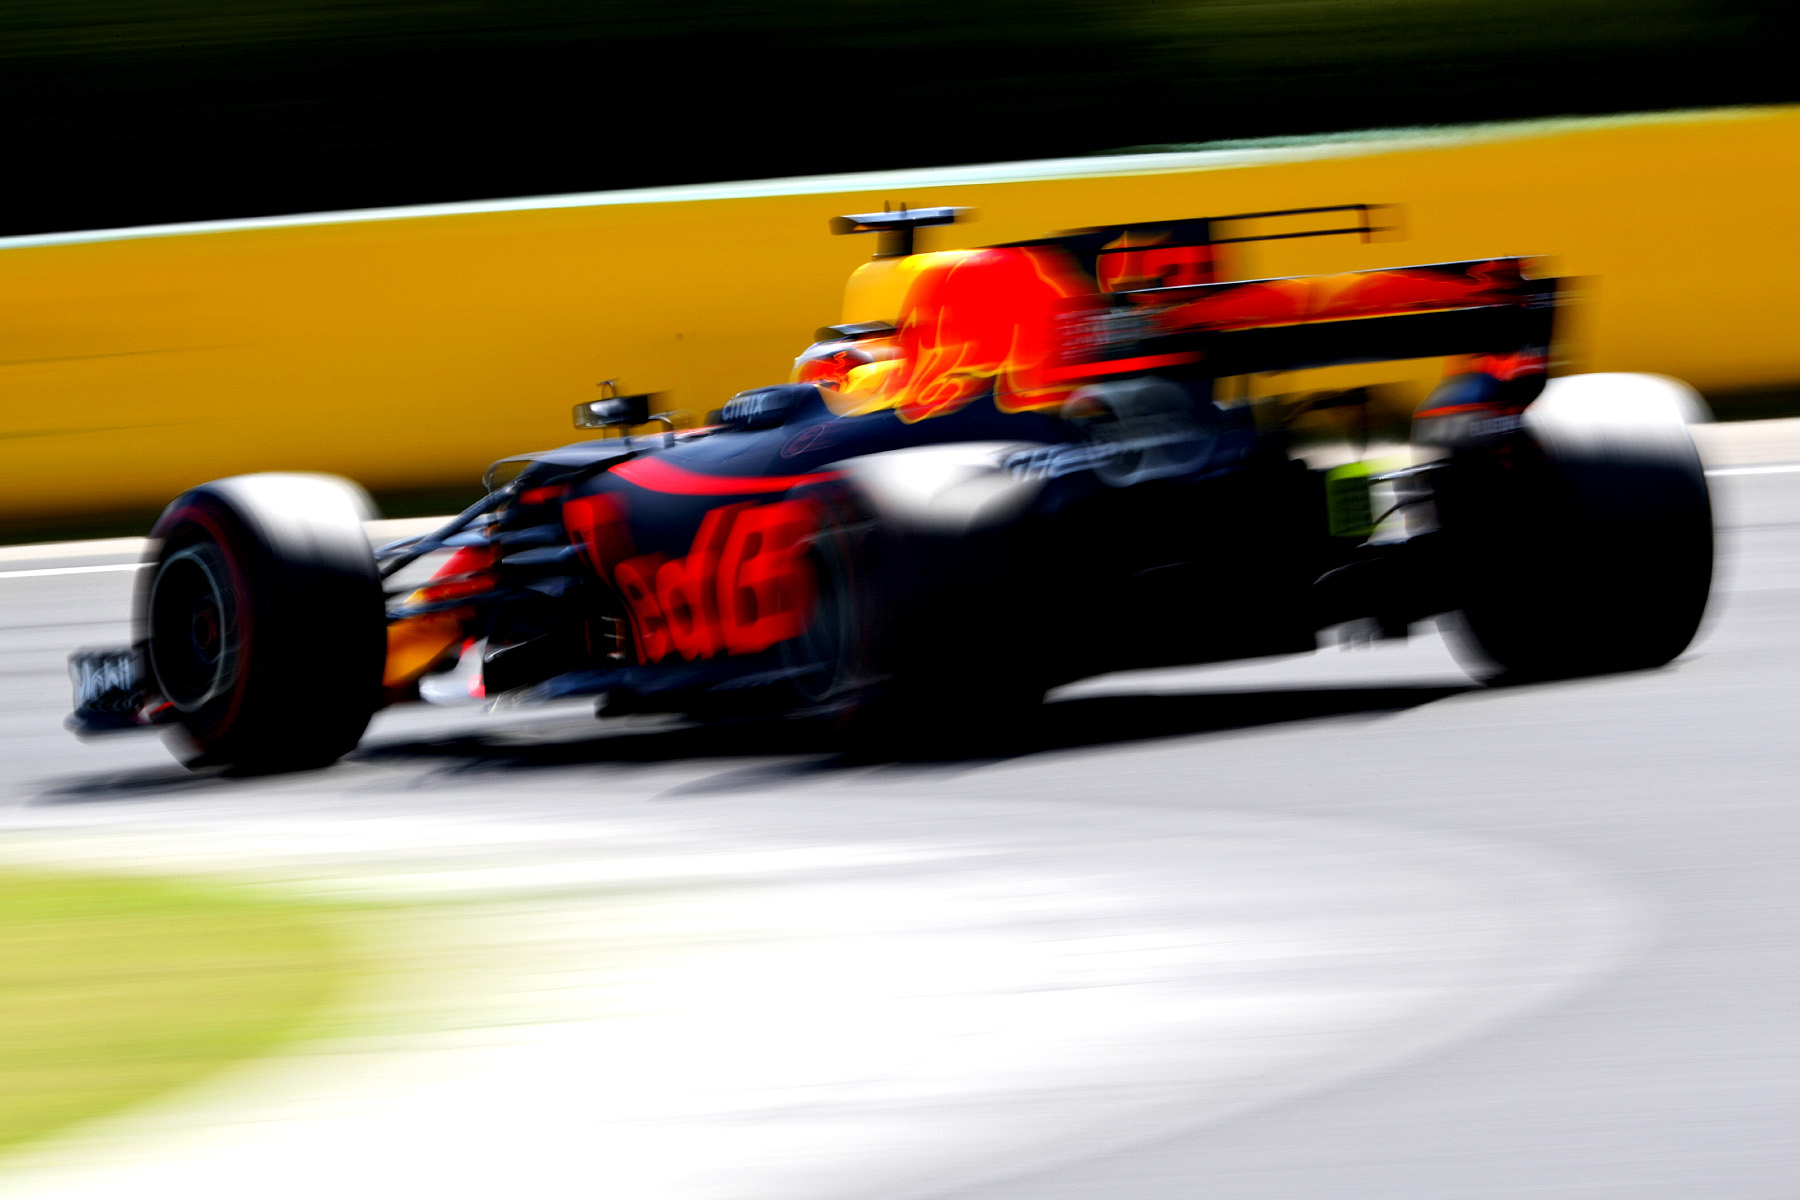 Daniel Ricciardo in his RB13 at the Hungaroring.